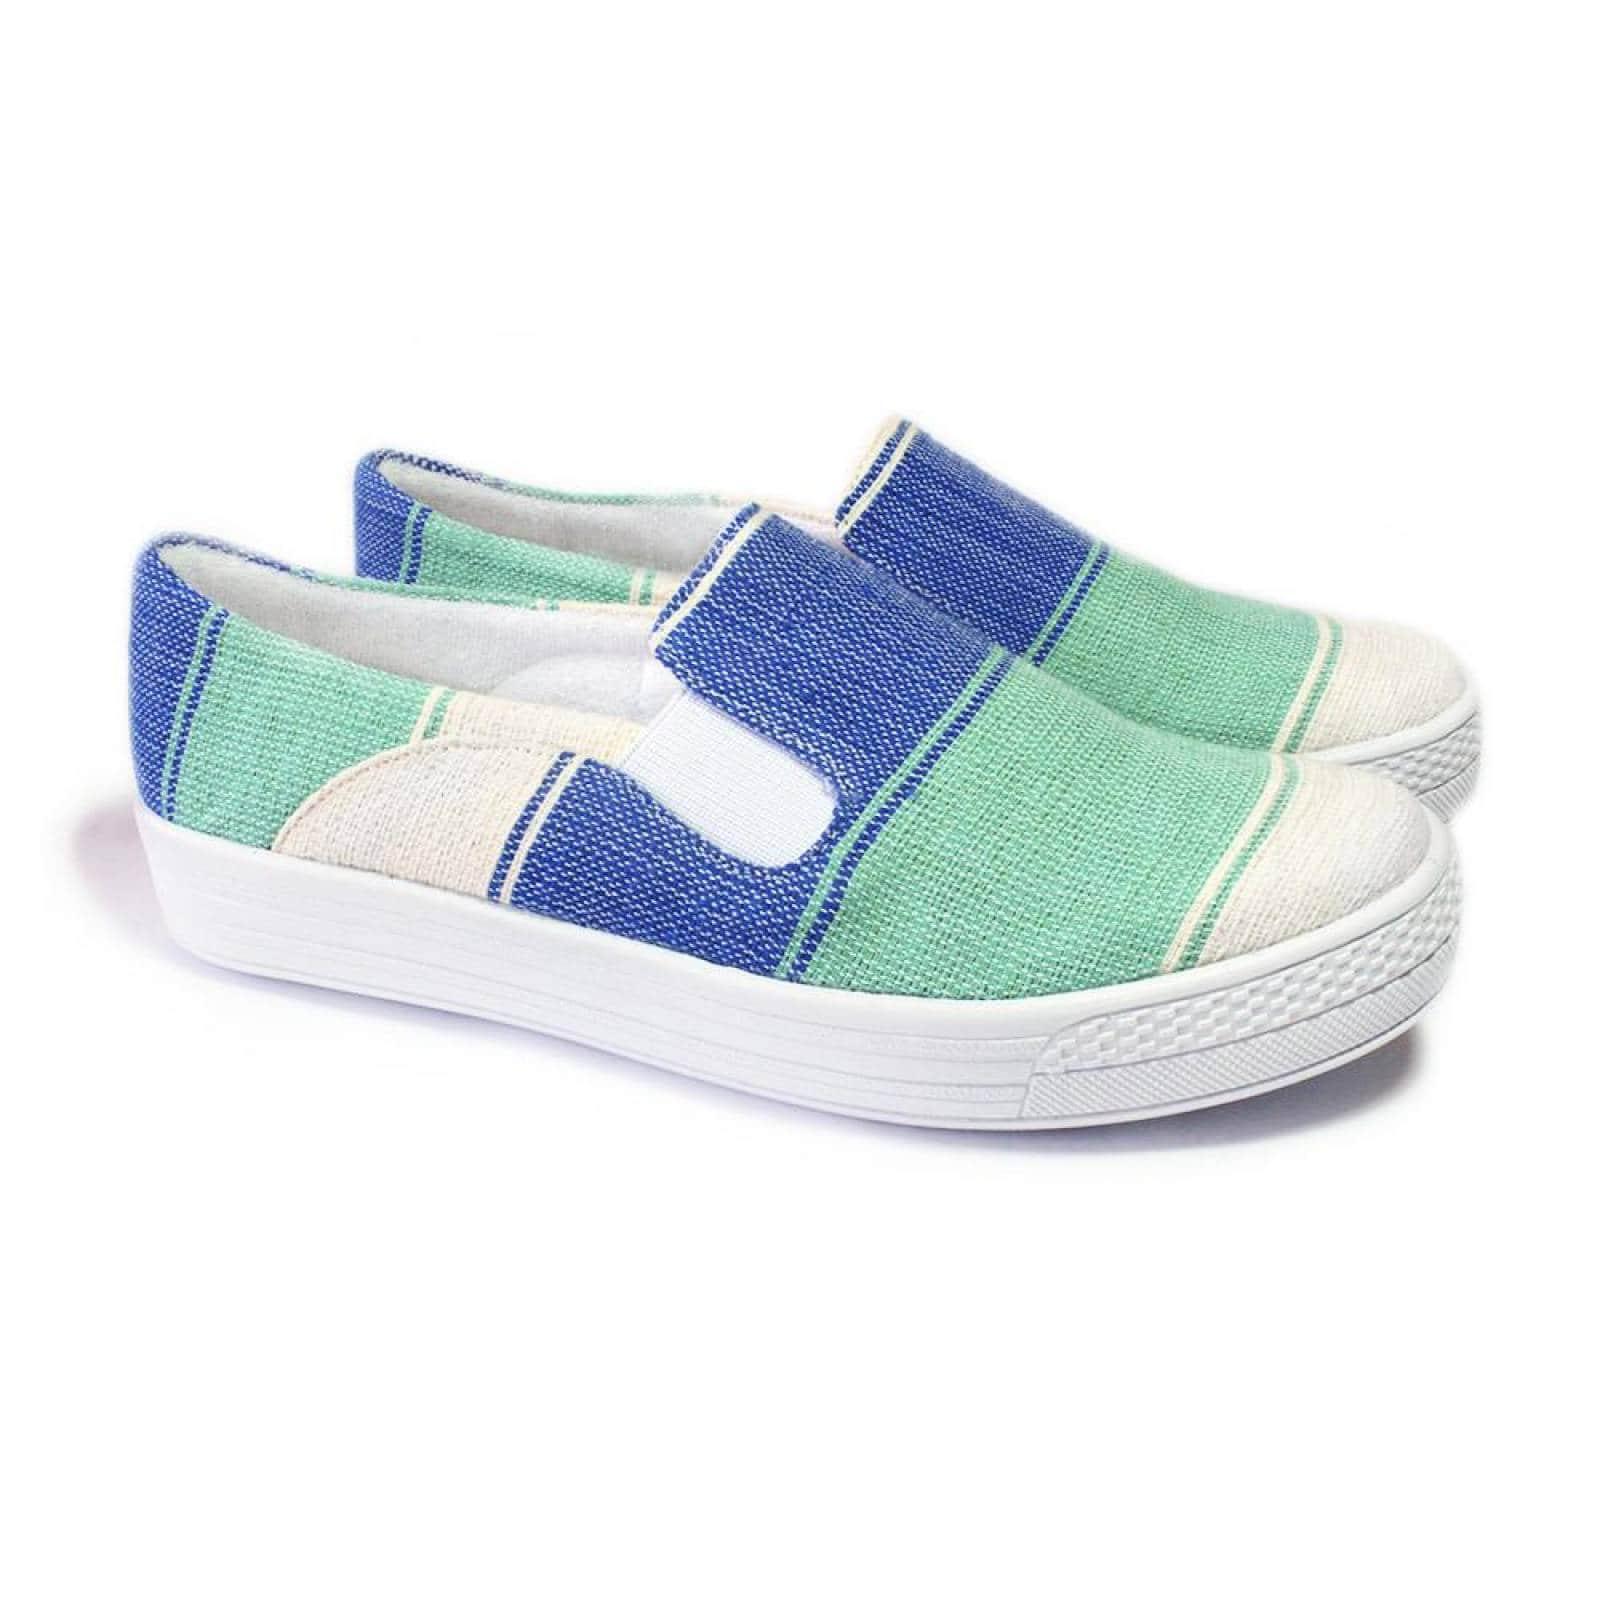 Tenis Zapato Slip On Artesanal Tela Mujer Lola Azul Komoni Talla 22